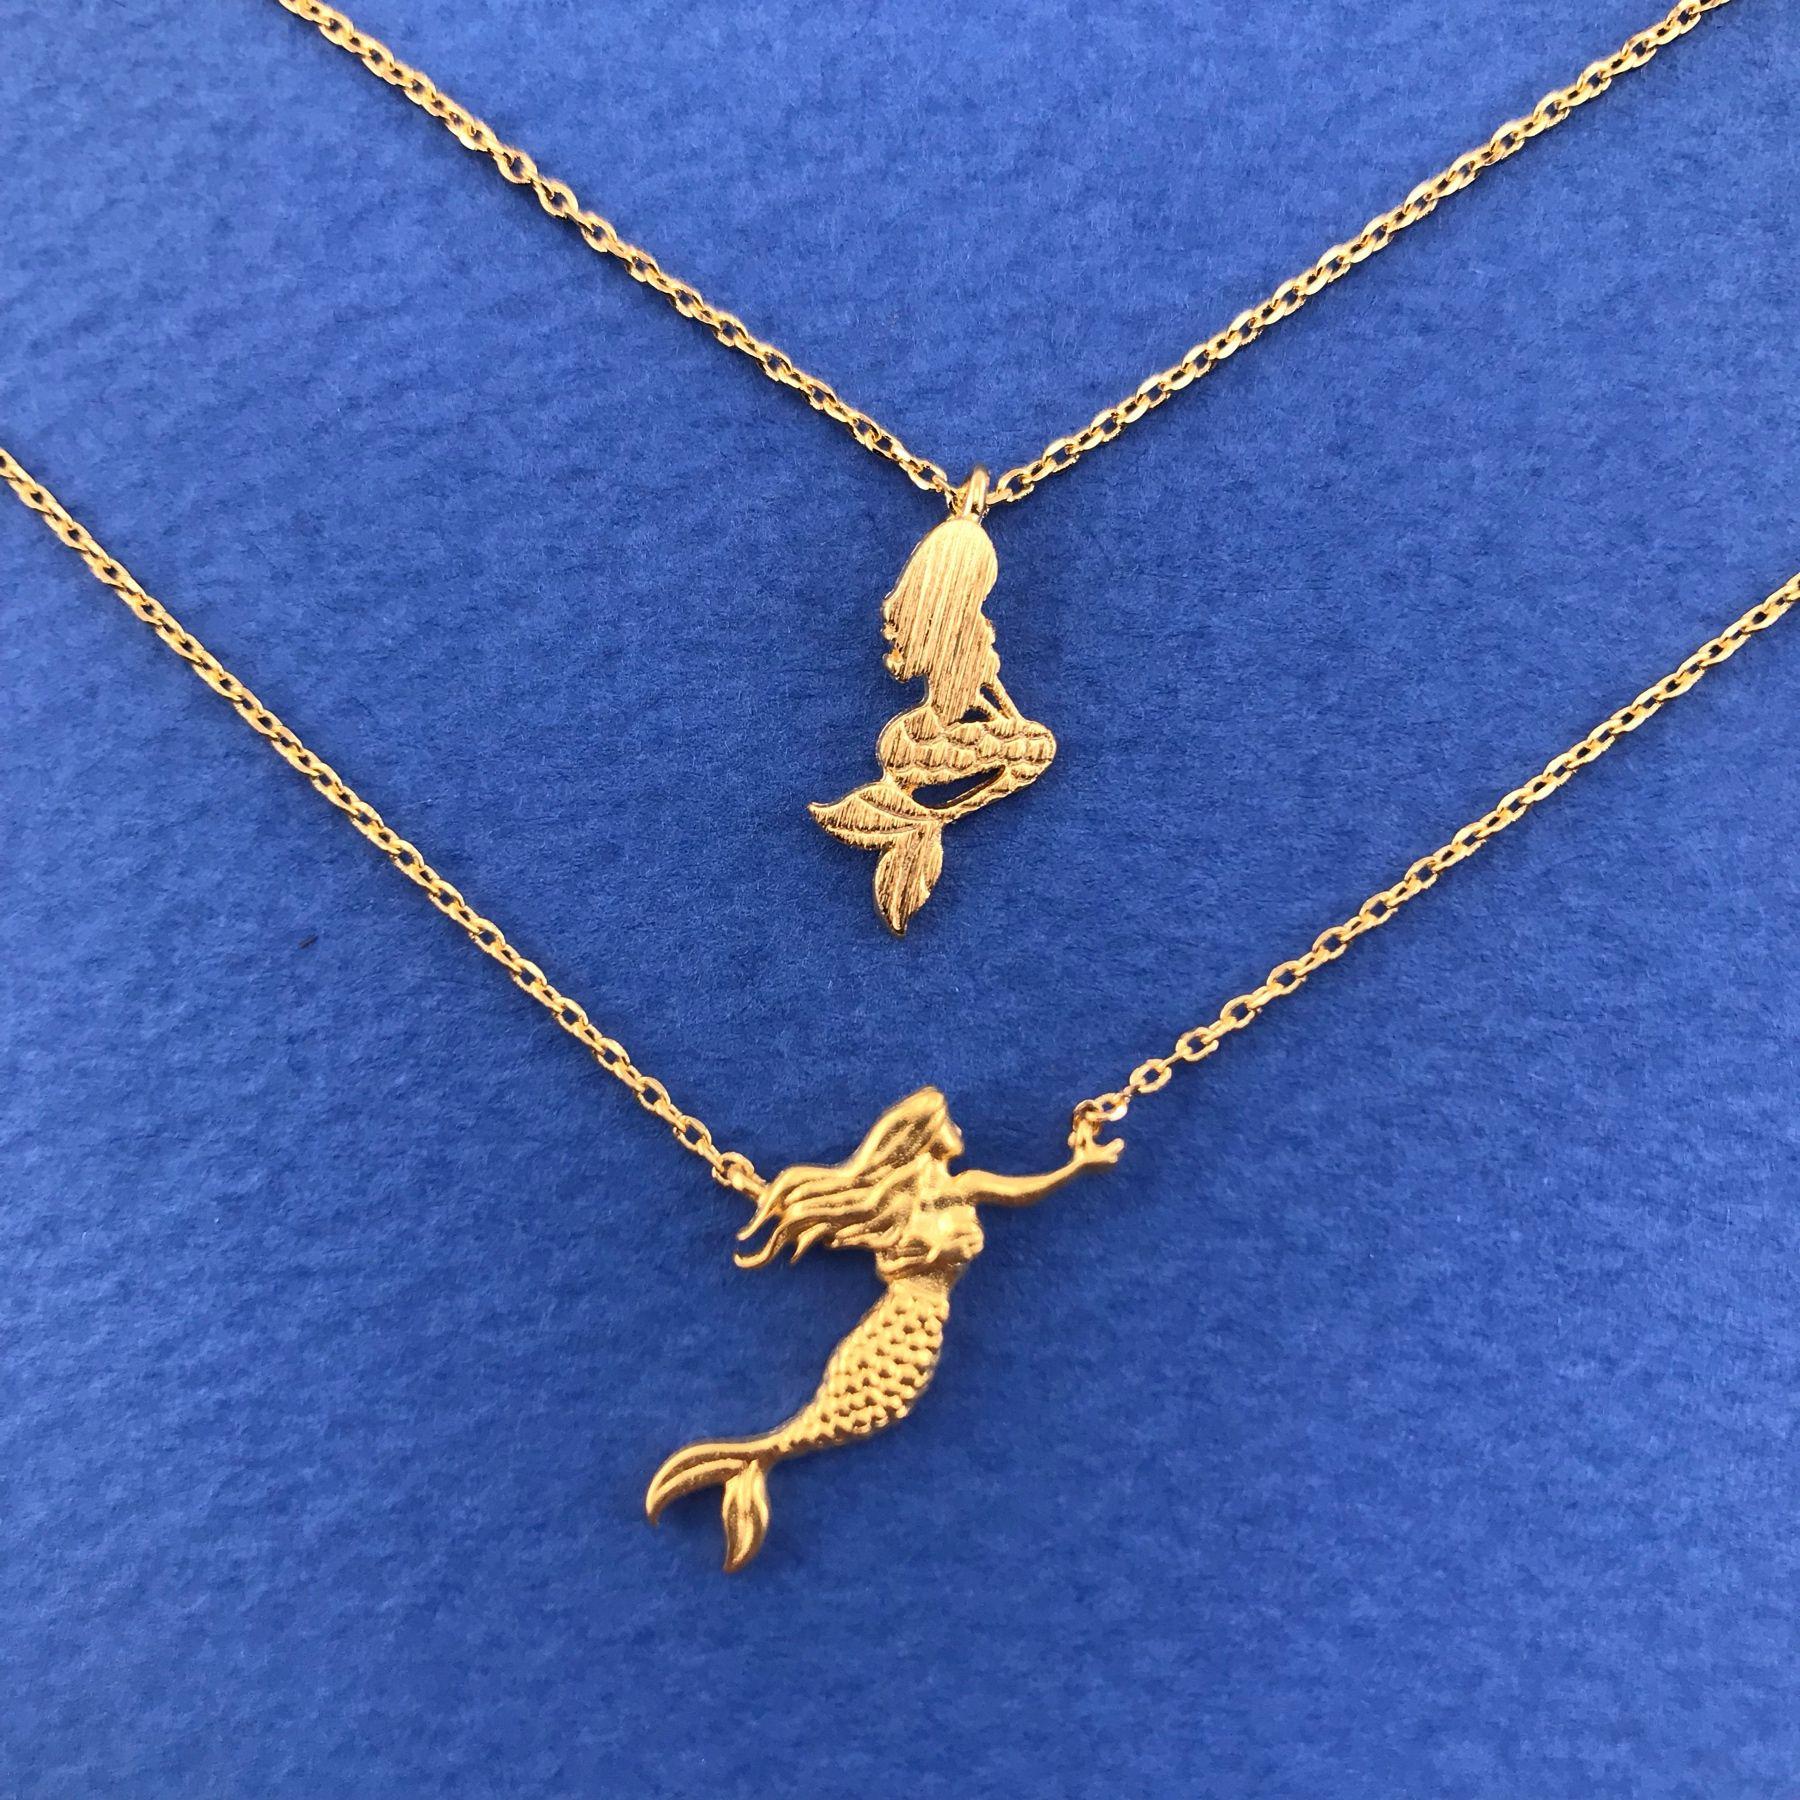 Mermaid Pendant Sea Life Tail Fin Mermaid Tail Necklace Charm Necklace Jewelry Charm Necklace Beach